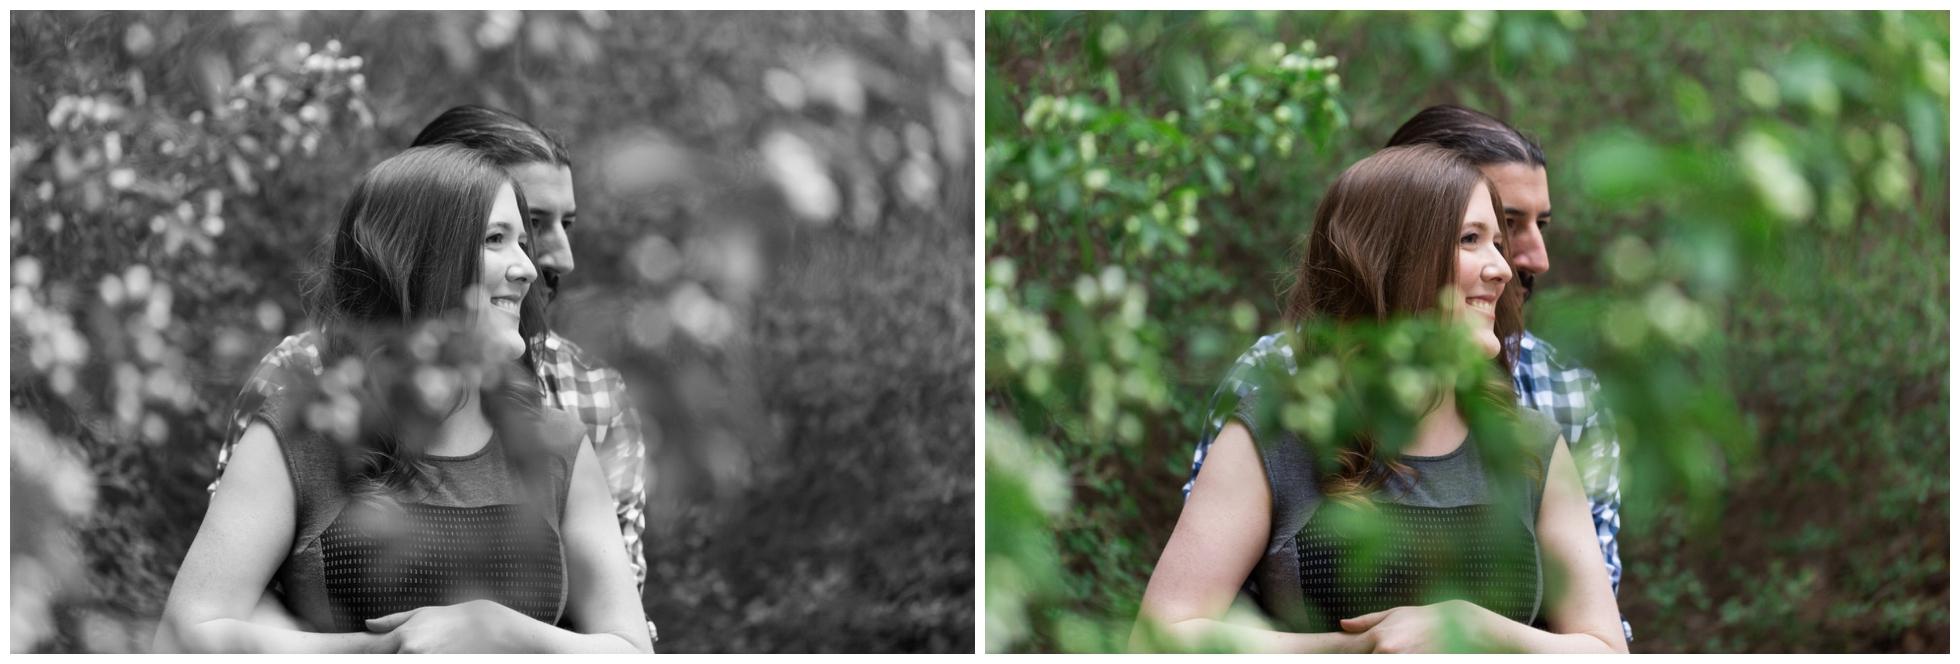 Kate and Jordan Edmonton Engagement Session (Life by Selena Photography)_0007.jpg